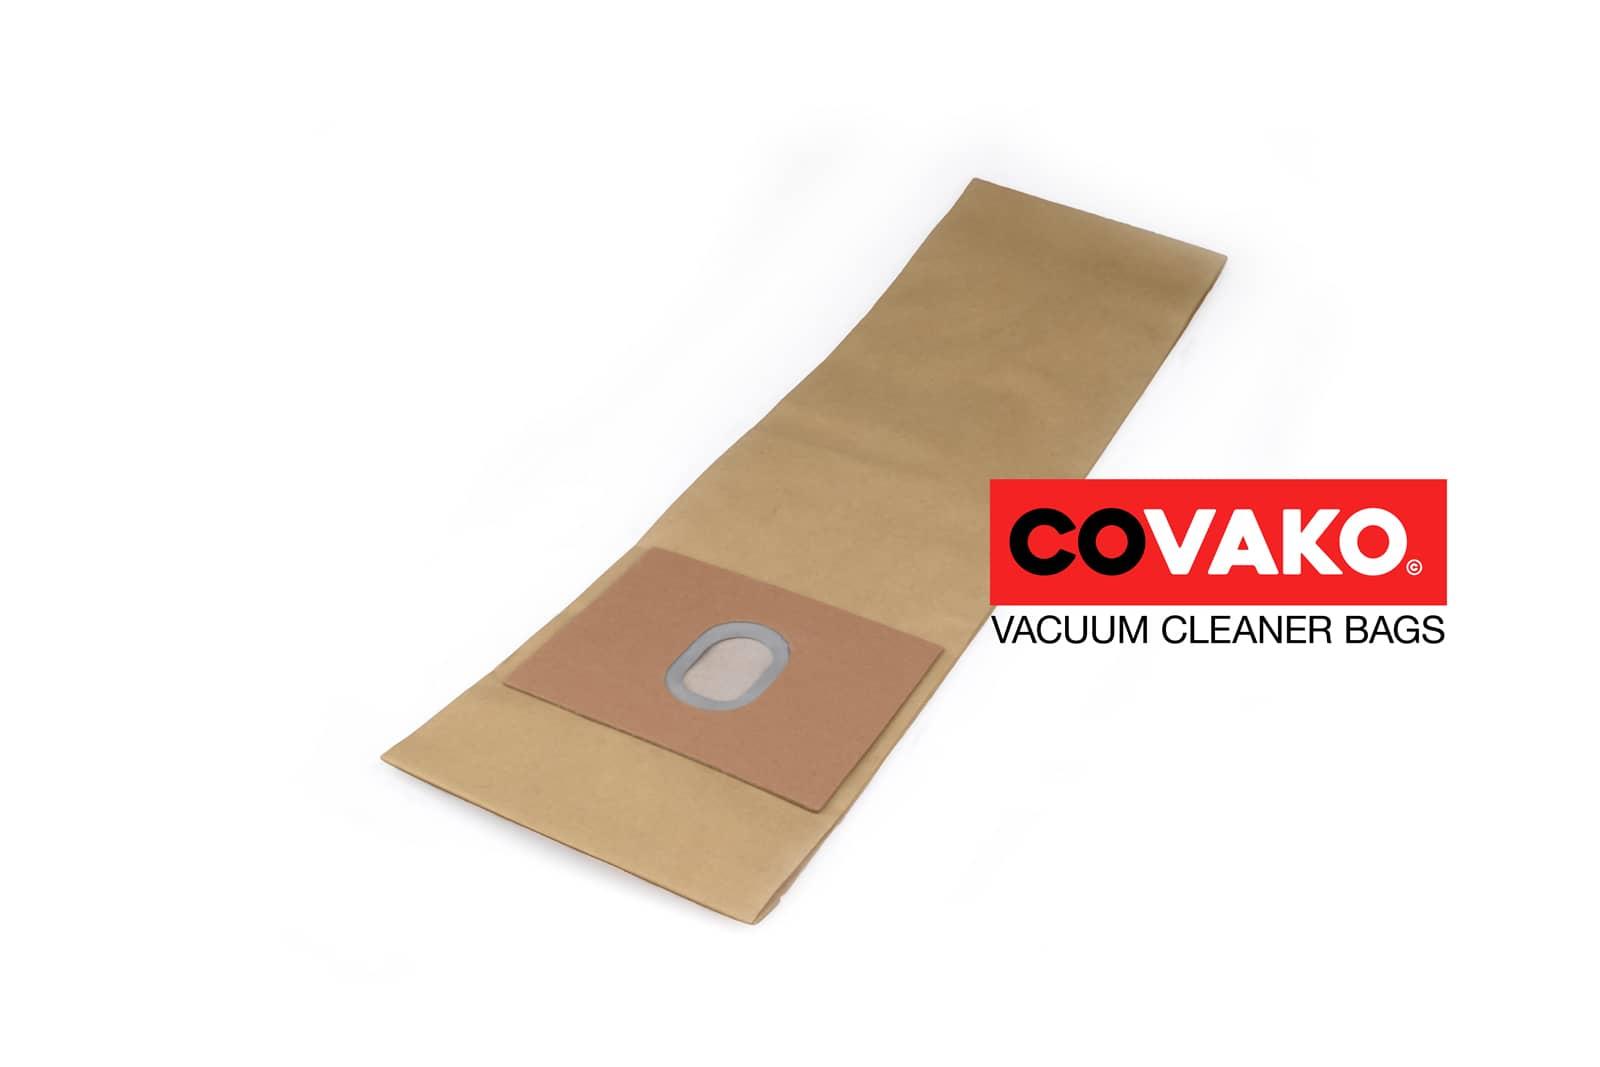 Bosch SK 2 / Paper - Bosch vacuum cleaner bags